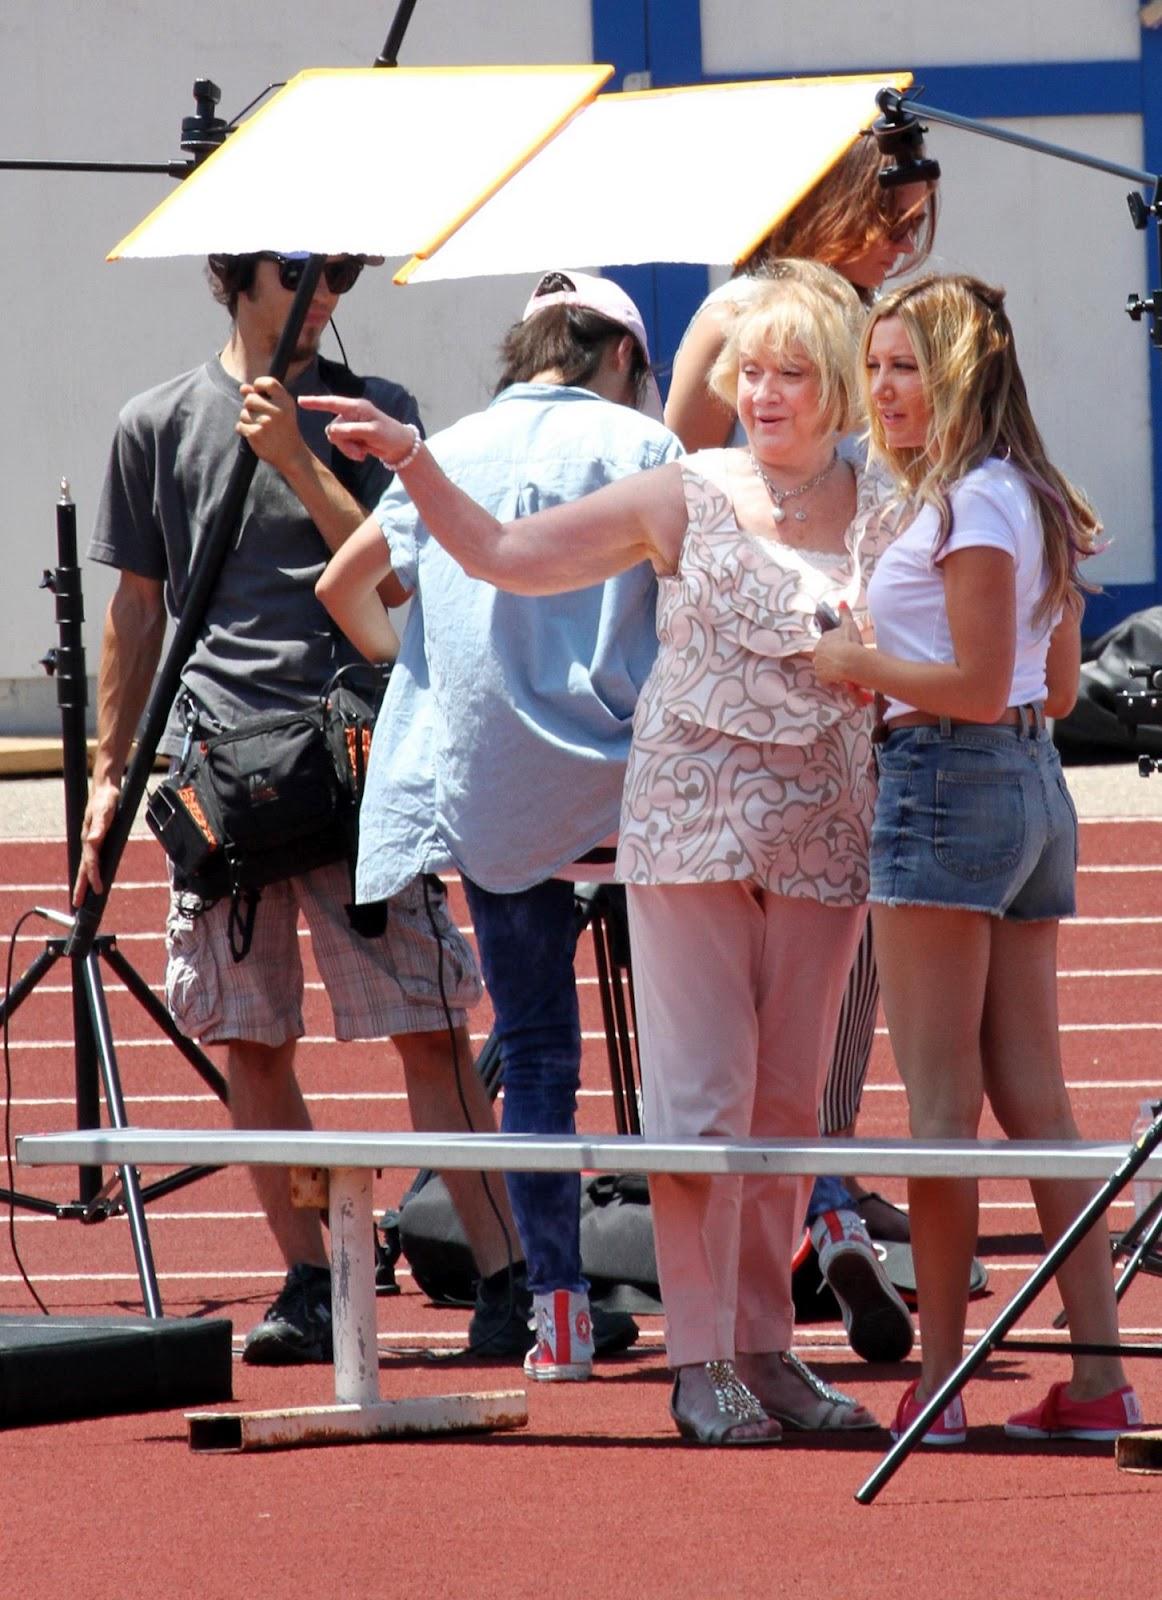 http://2.bp.blogspot.com/-qogYjL49BG0/UBy8cvD-9lI/AAAAAAAAT08/u6L1DaoTtSc/s1600/Ashley+Tisdale+Booty+and+Leggy+filming+PSA+for+the+Puma\'s+Pink+Project+in+LA+-+July+23,+2012+08.jpg